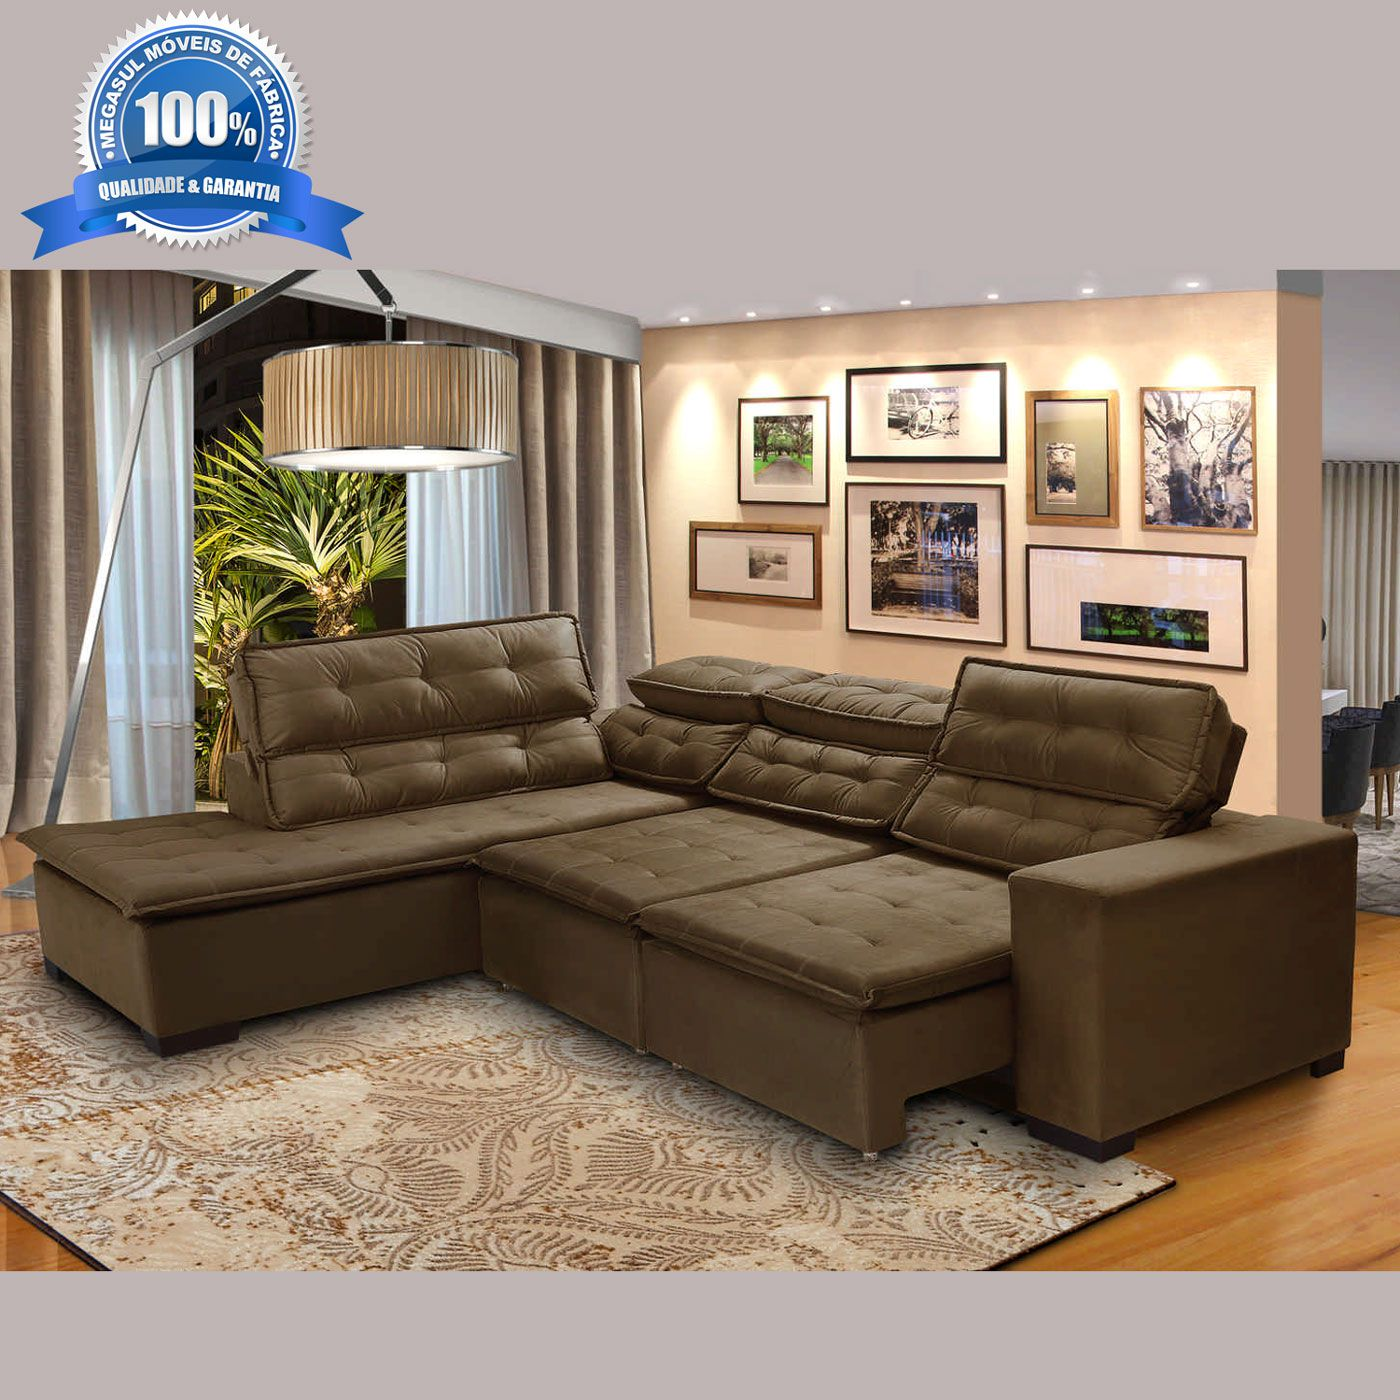 57b1113a6 Sofa De Canto Retratil E Reclinavel 5 Lugares - ViewLetter.CO